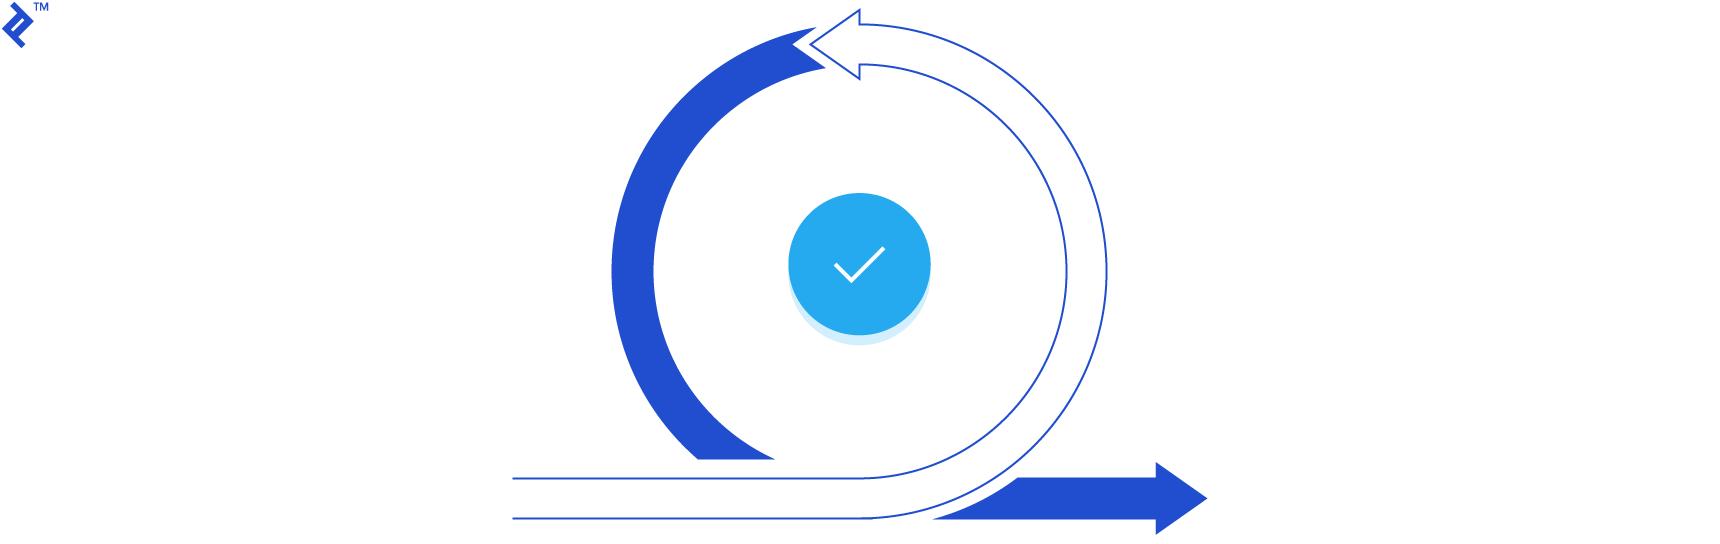 Agile methodology as part of digital transformation